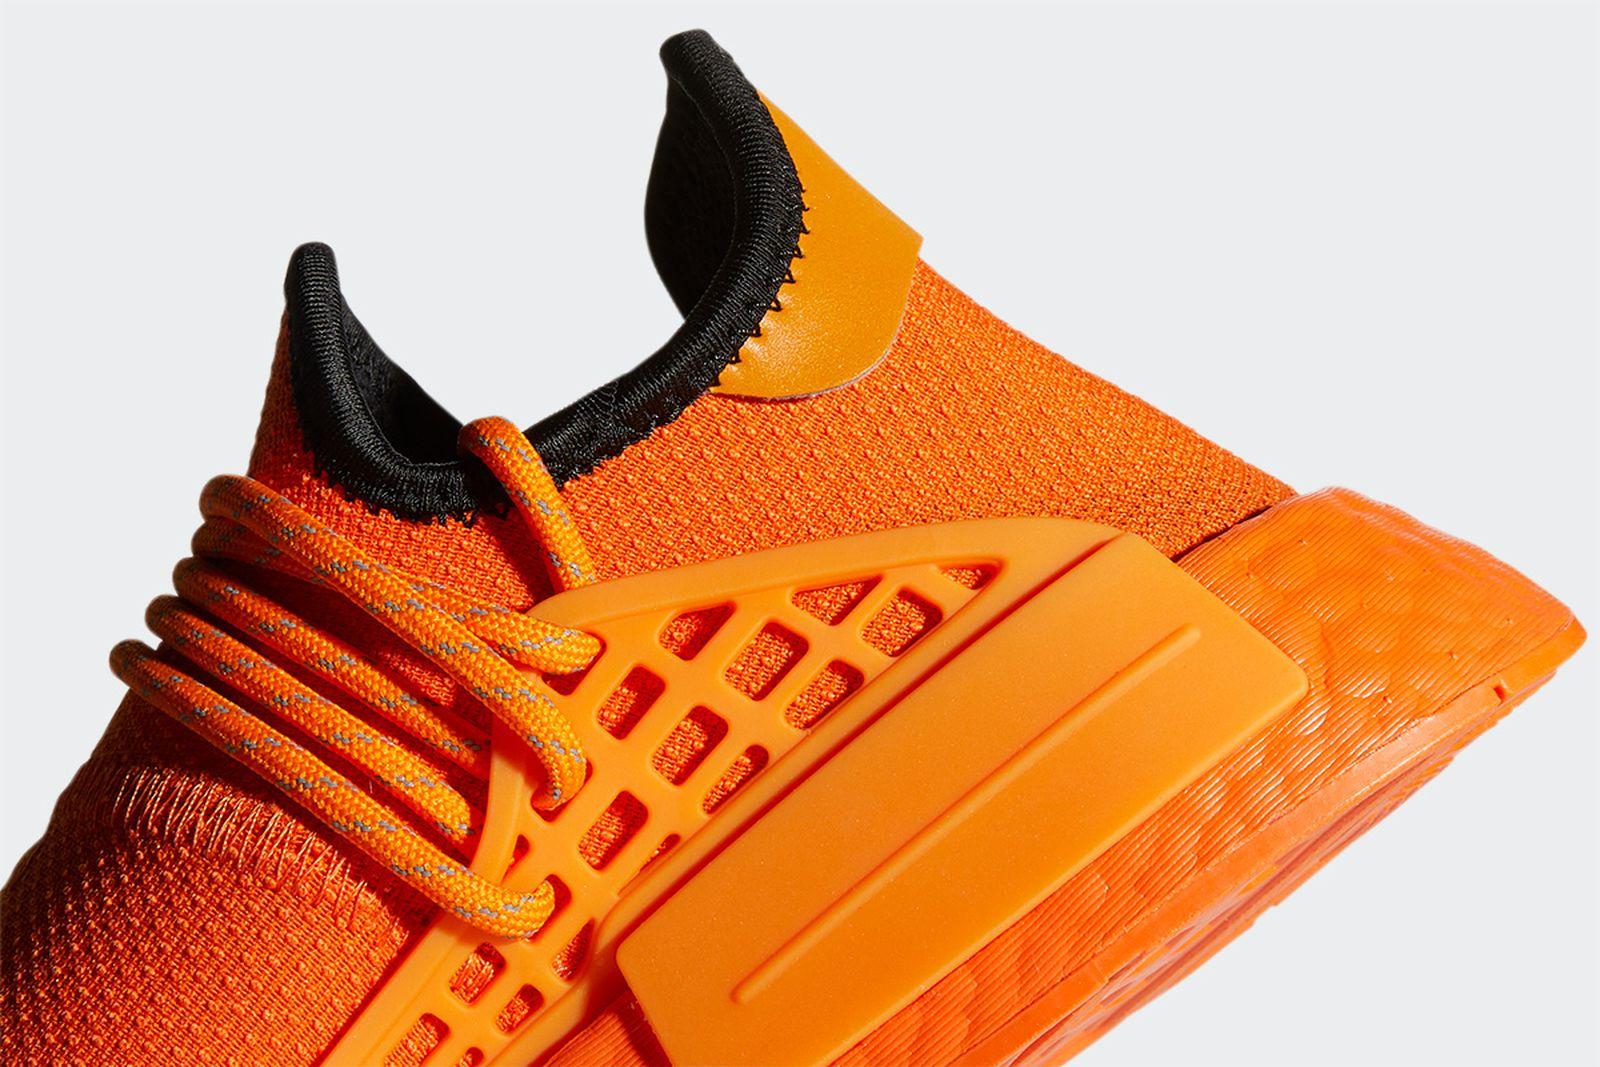 pharrell-williams-adidas-originals-hu-nmd-orange-release-date-price-02